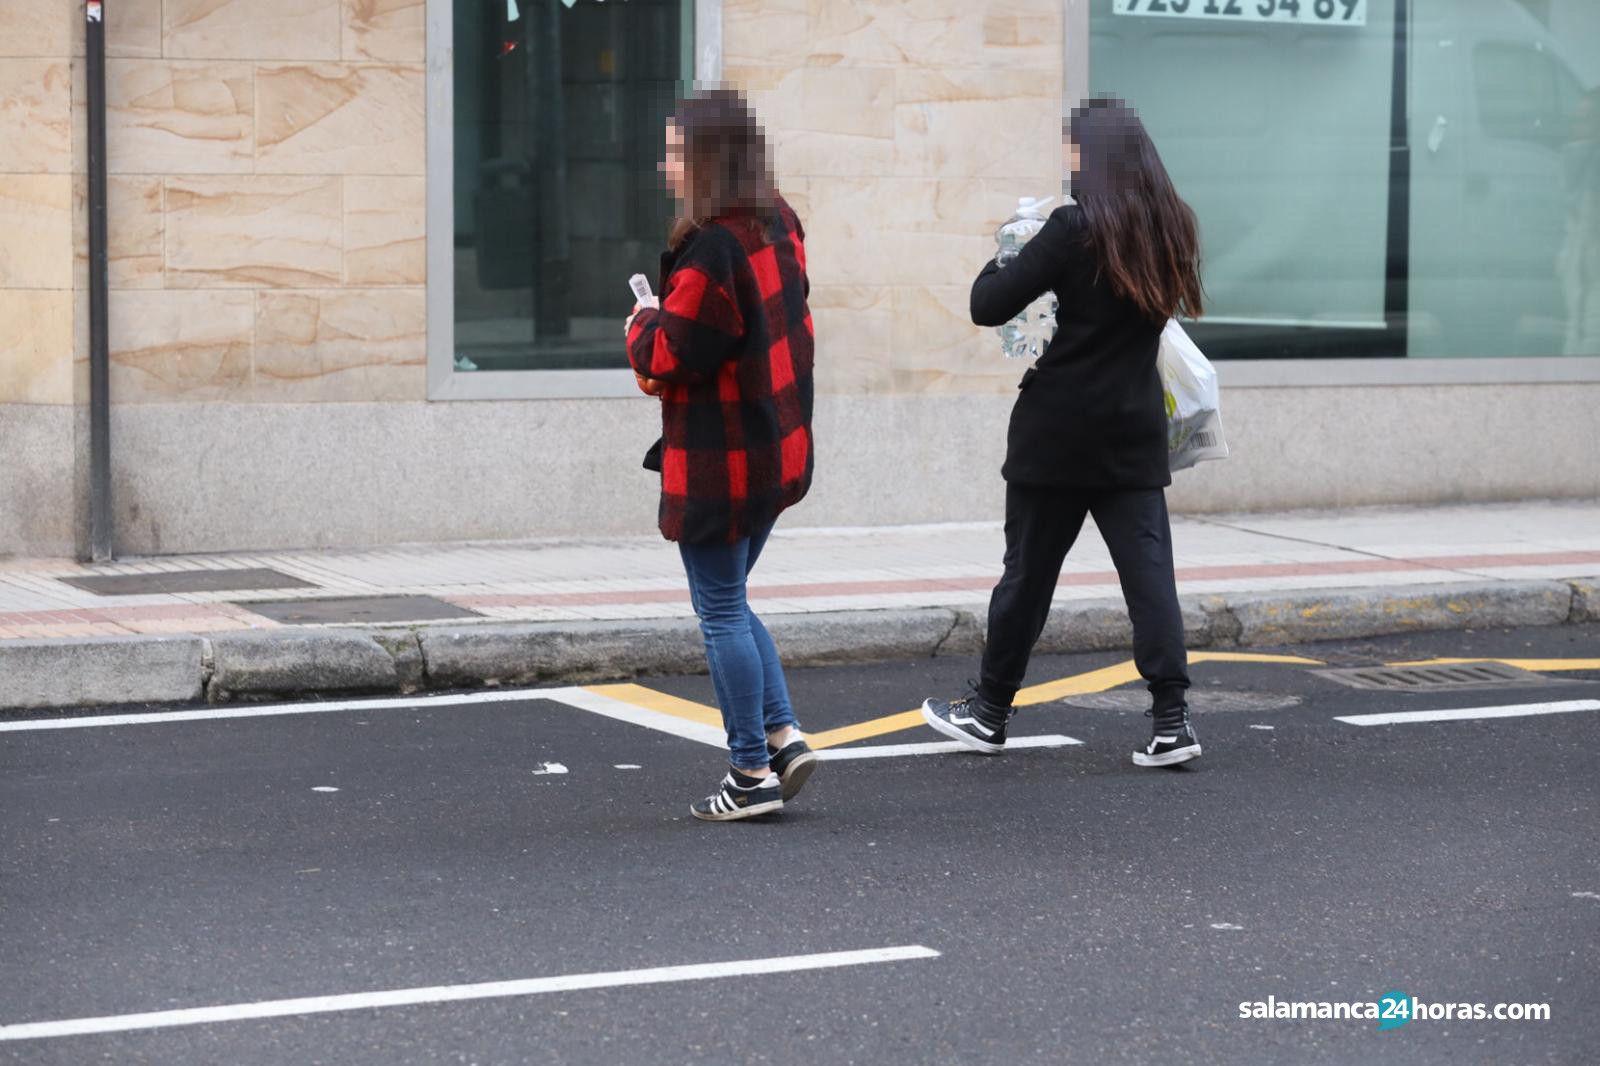 Peatones cruzando mal (2)